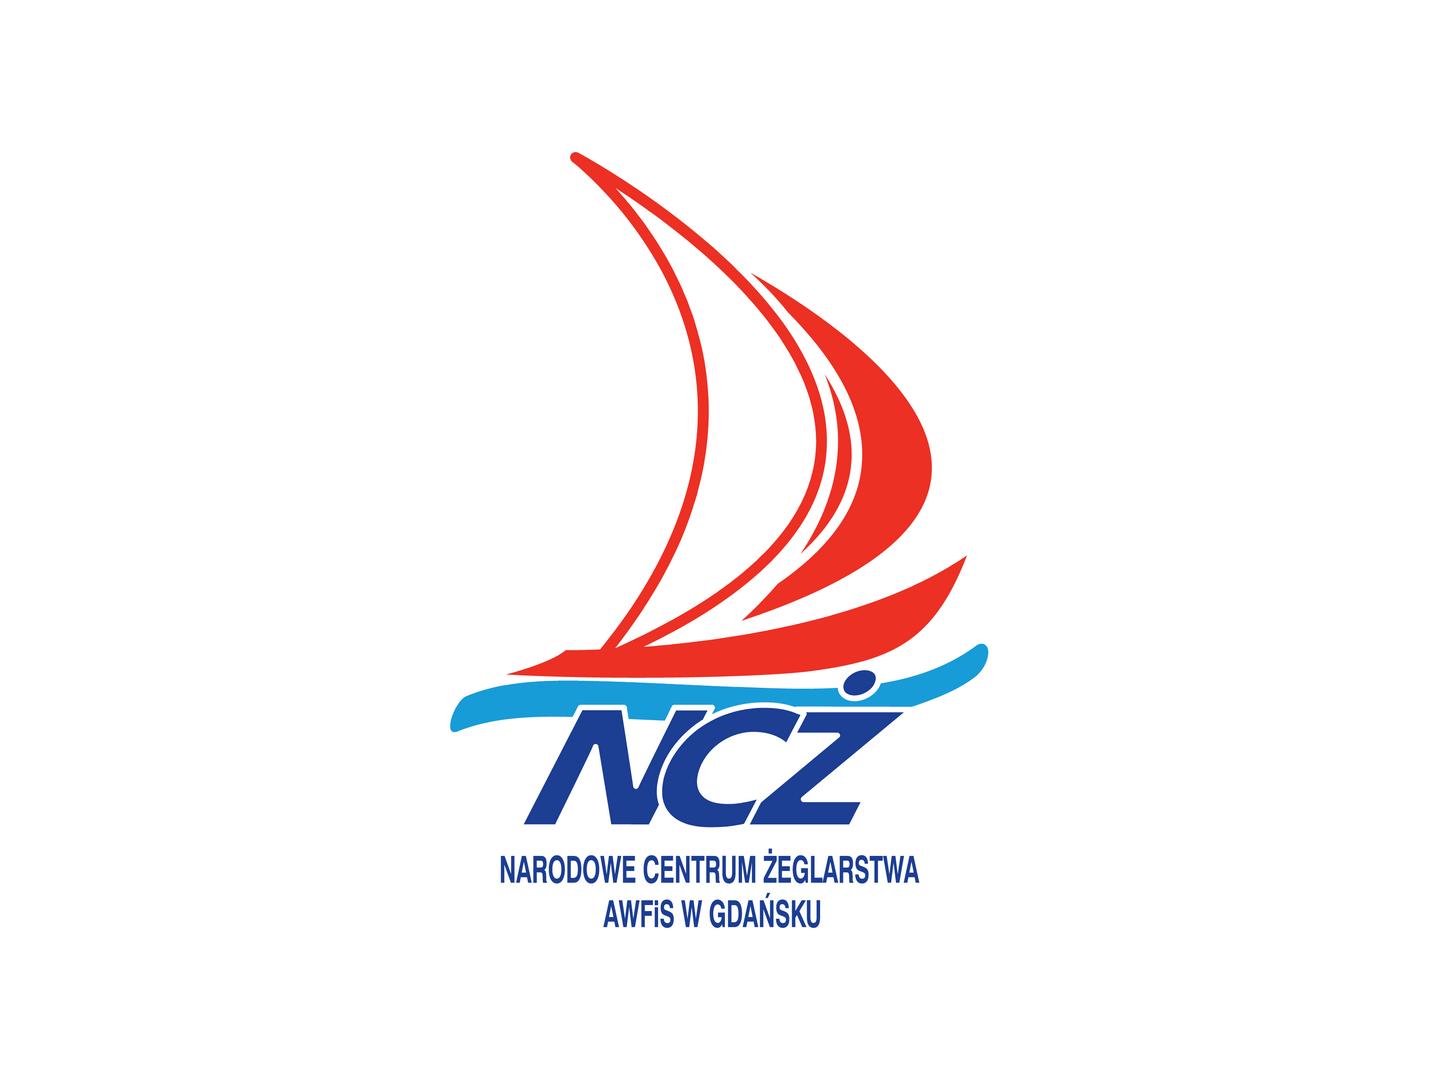 Narodowe Centrum Żeglarstwa